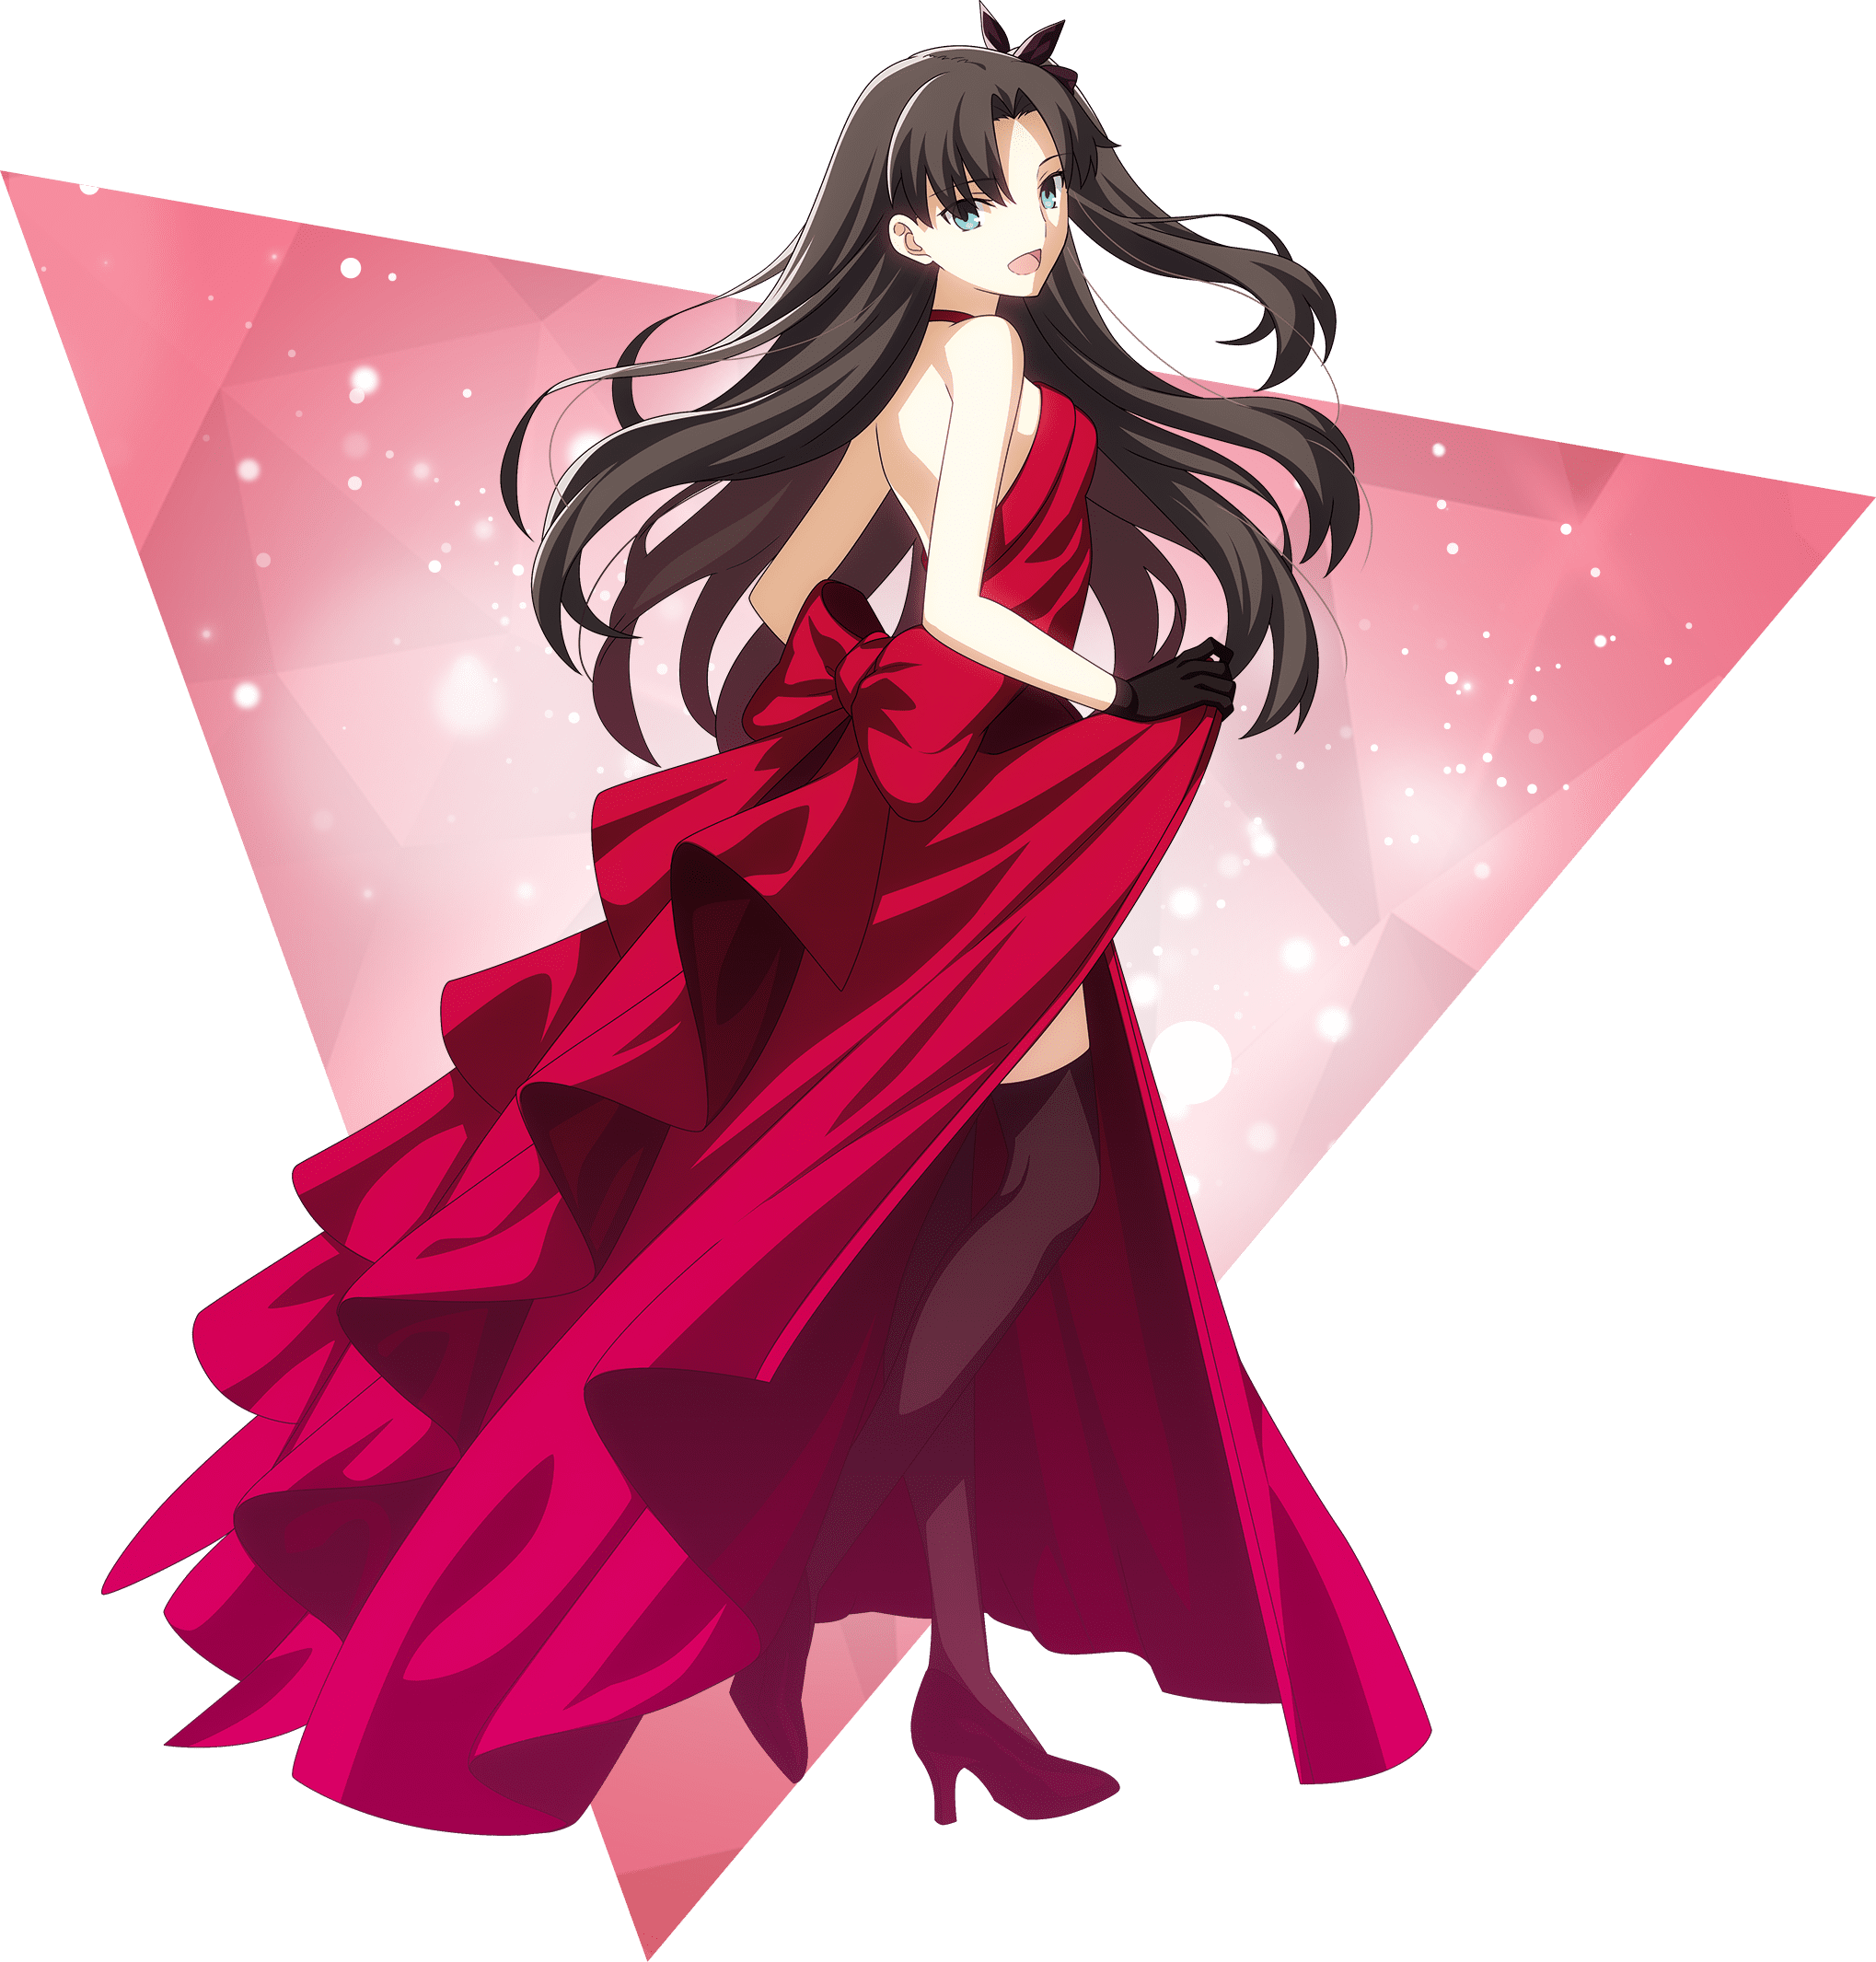 Nakau Fate Stay Night 15th Celebration Project Rin Tohsaka Fate Type Moon Fate Stay Night Rin Fate Stay Night Anime Fate Stay Night